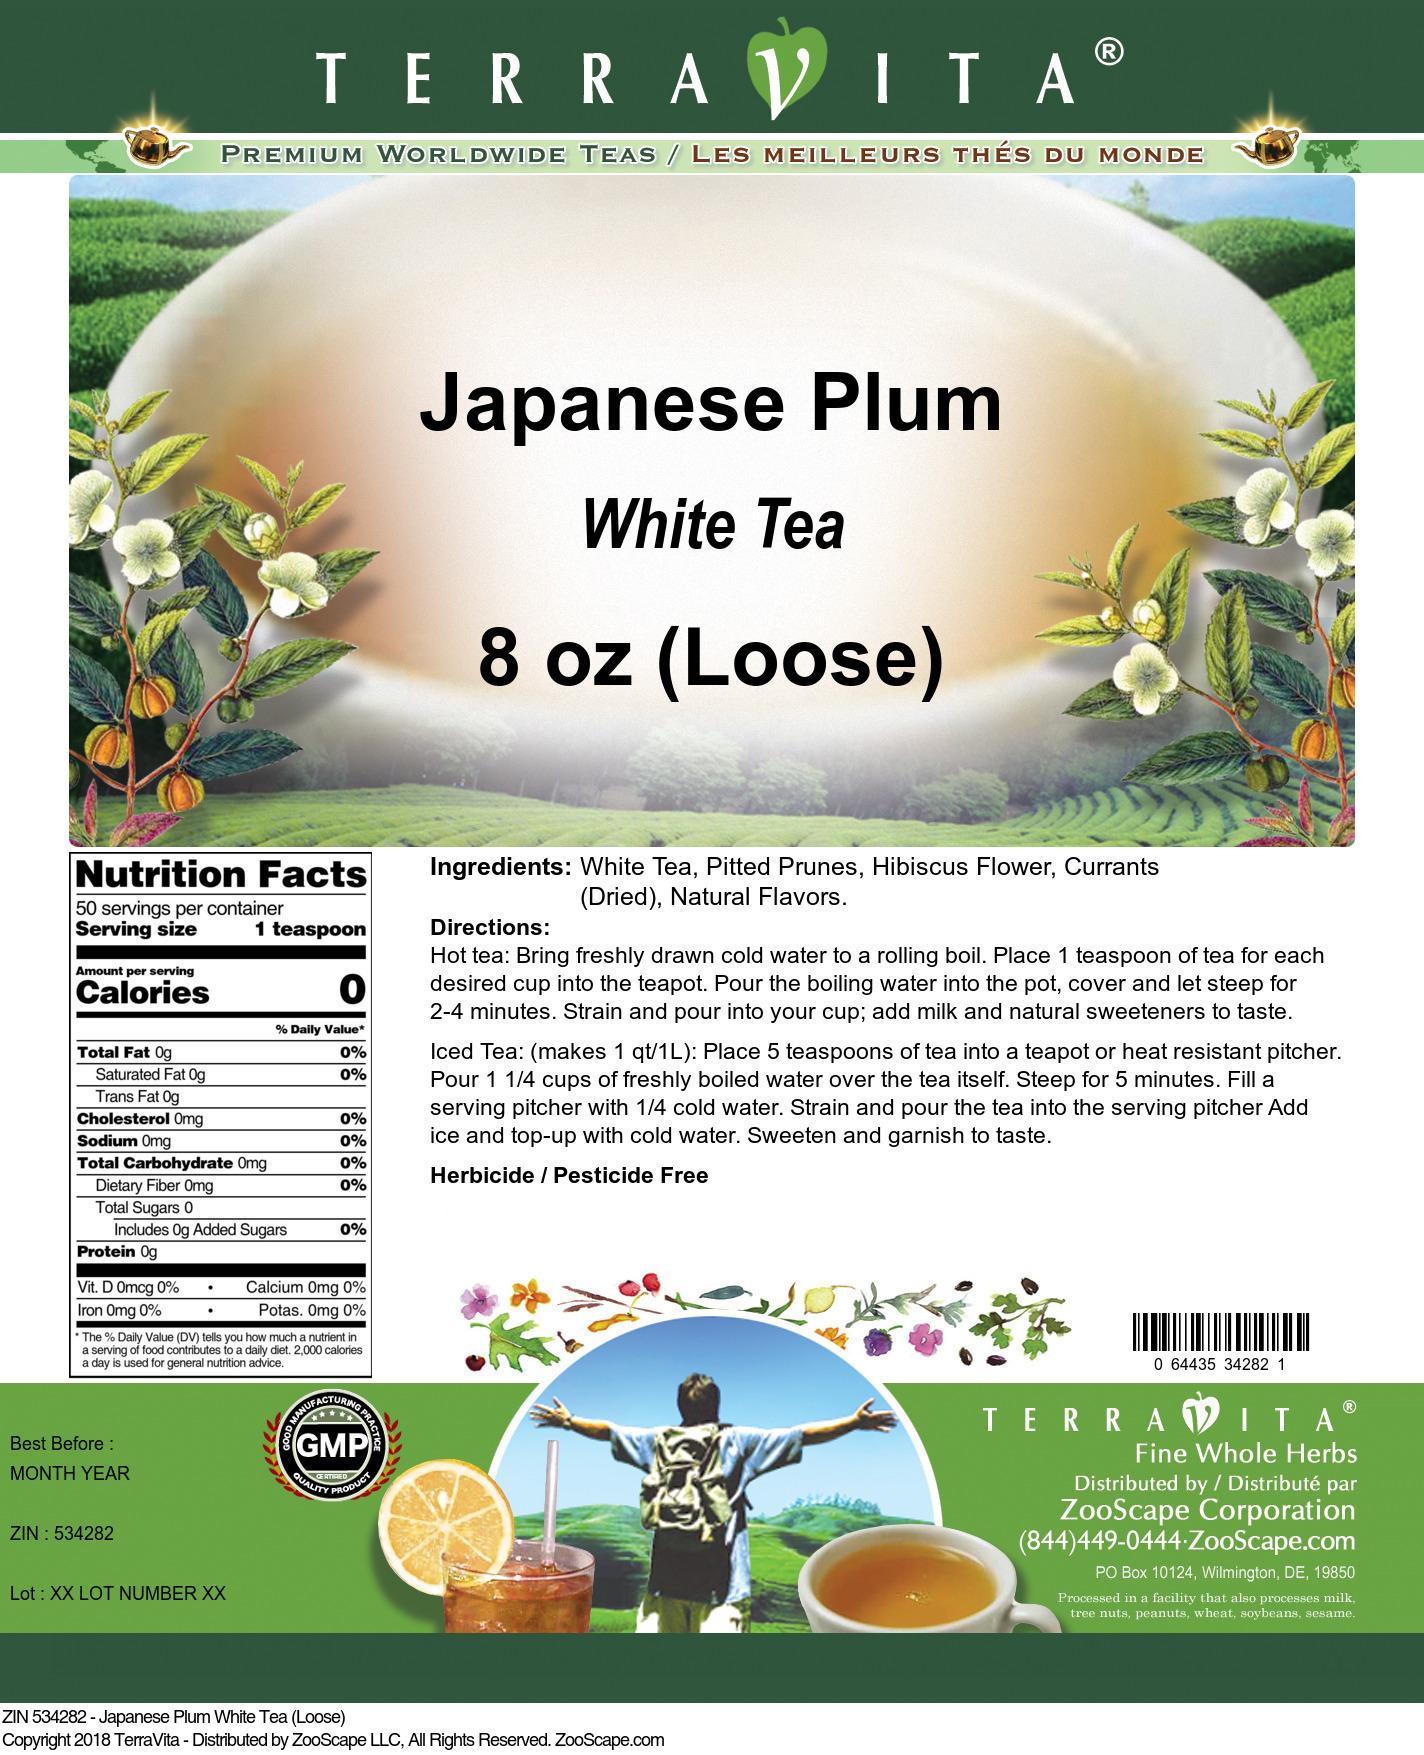 Japanese Plum White Tea